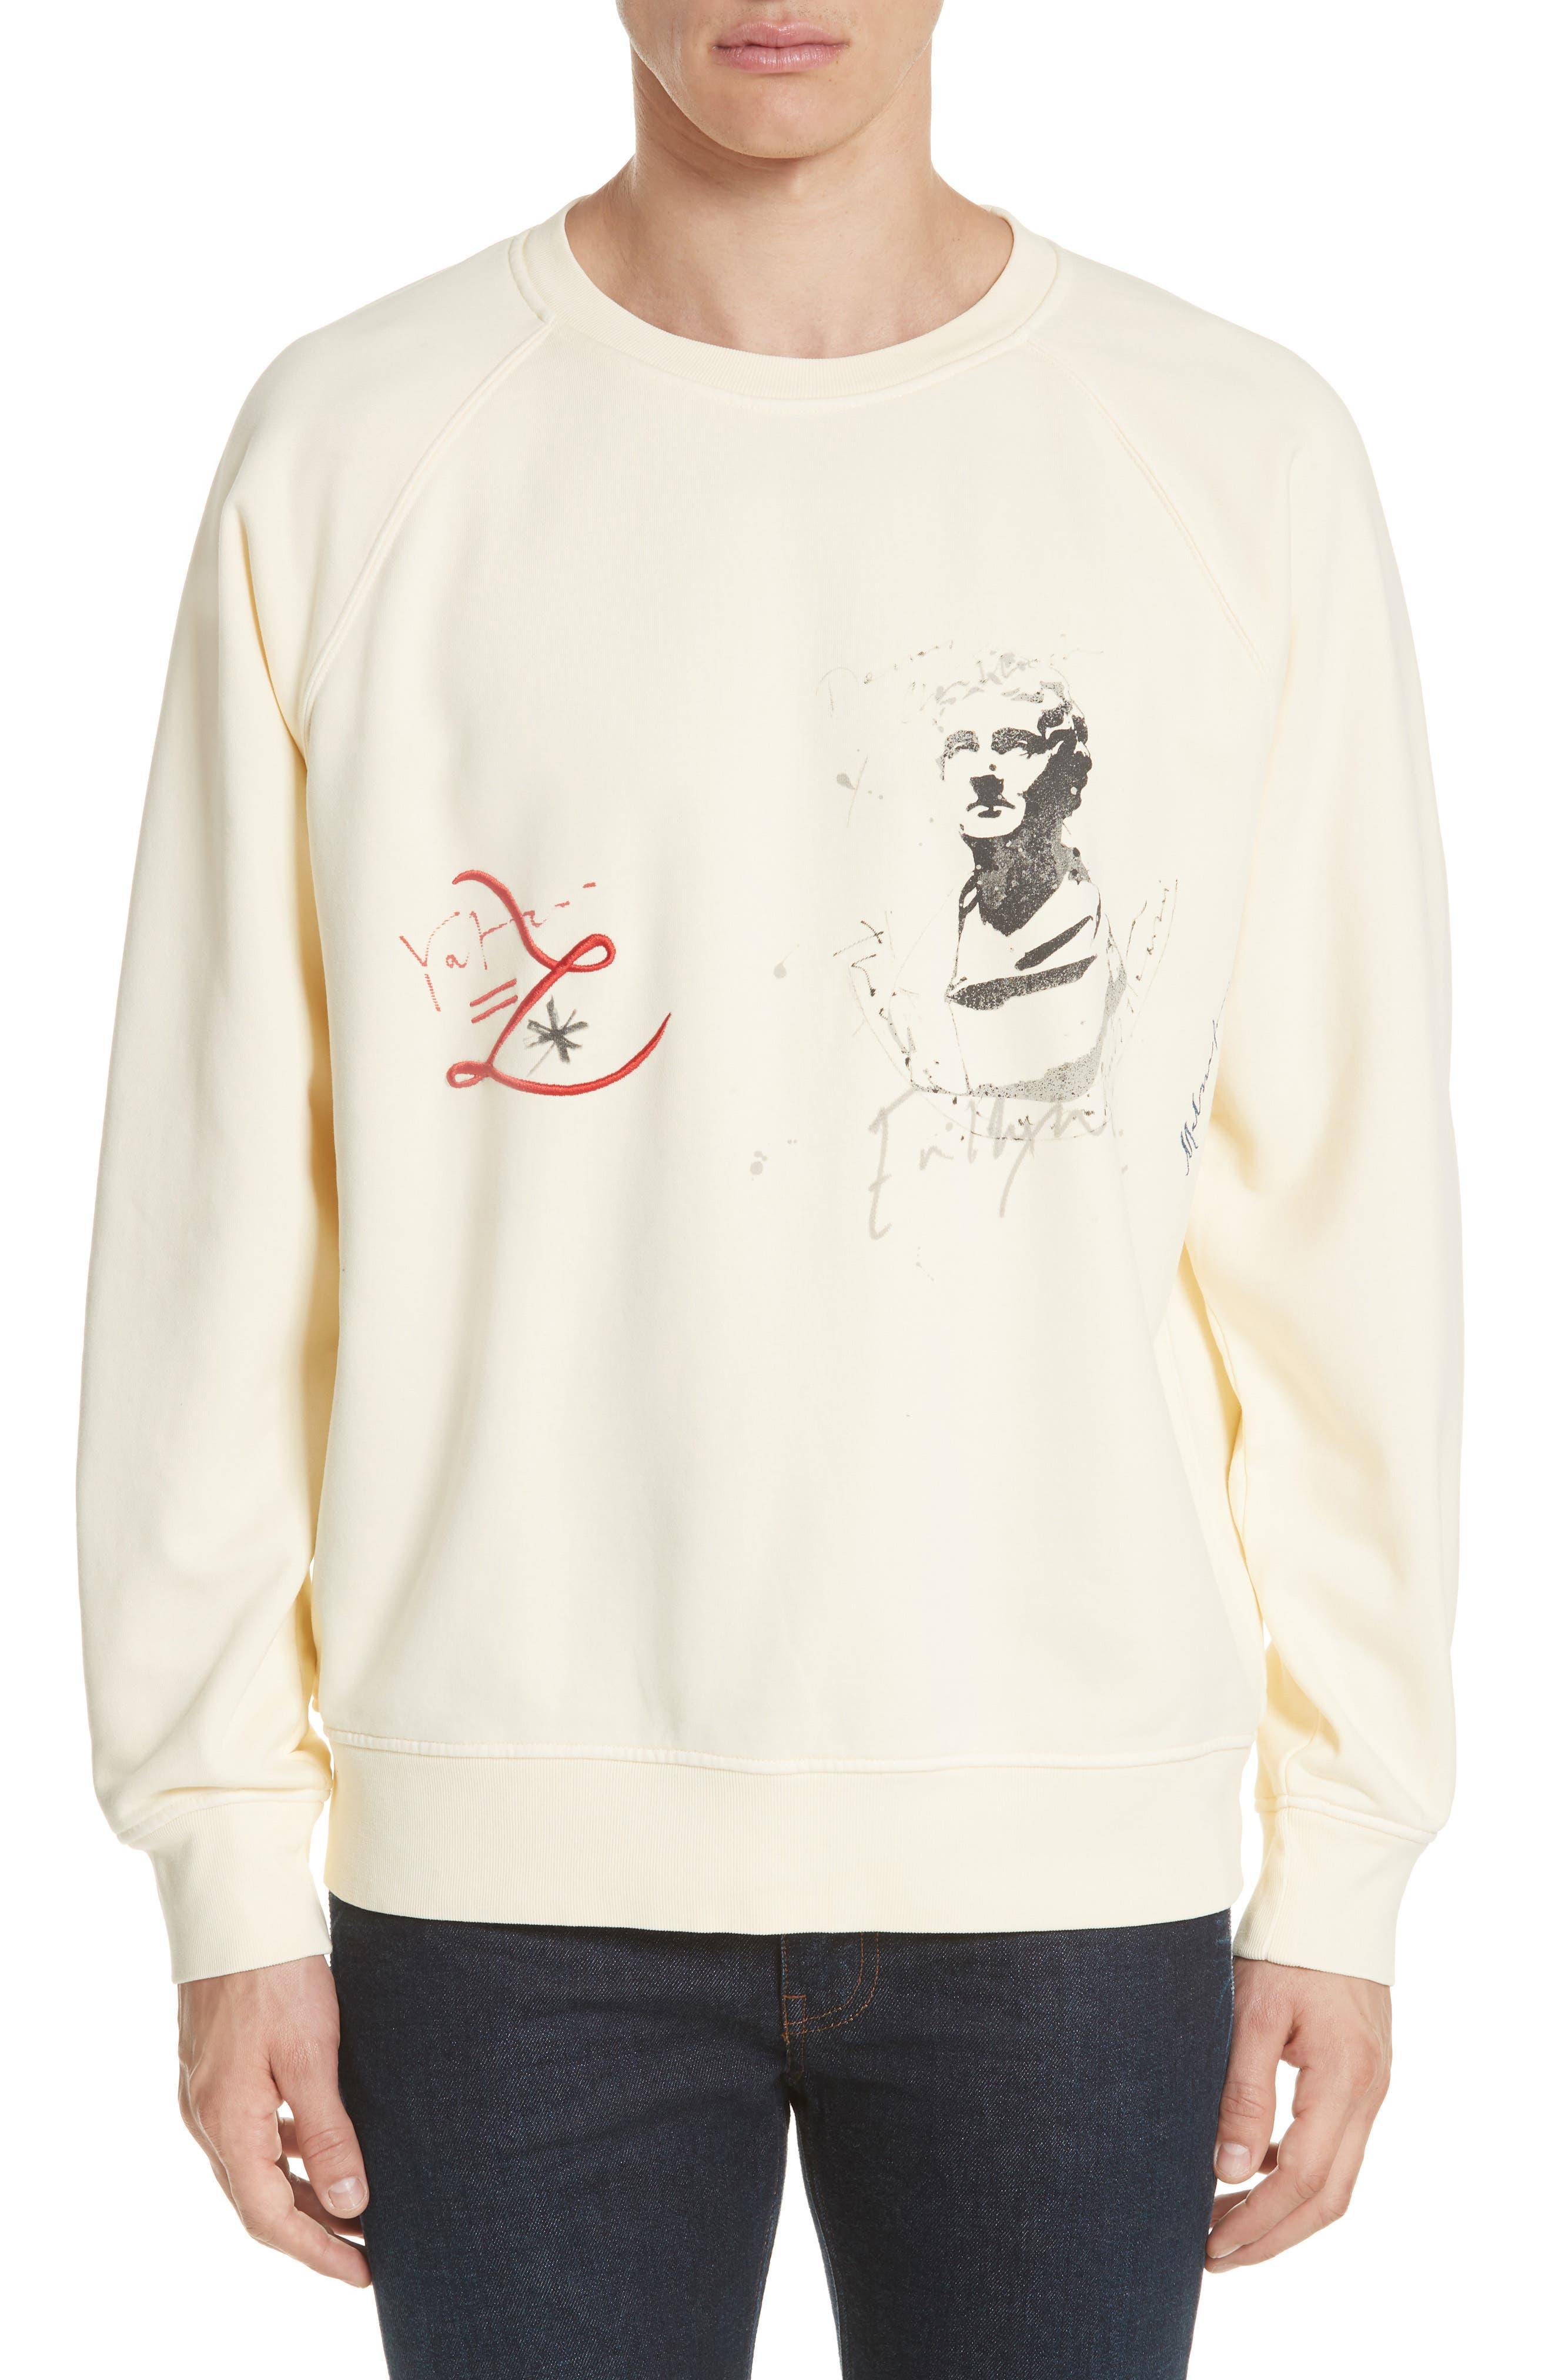 Burberry Earlford Graphic Sweatshirt